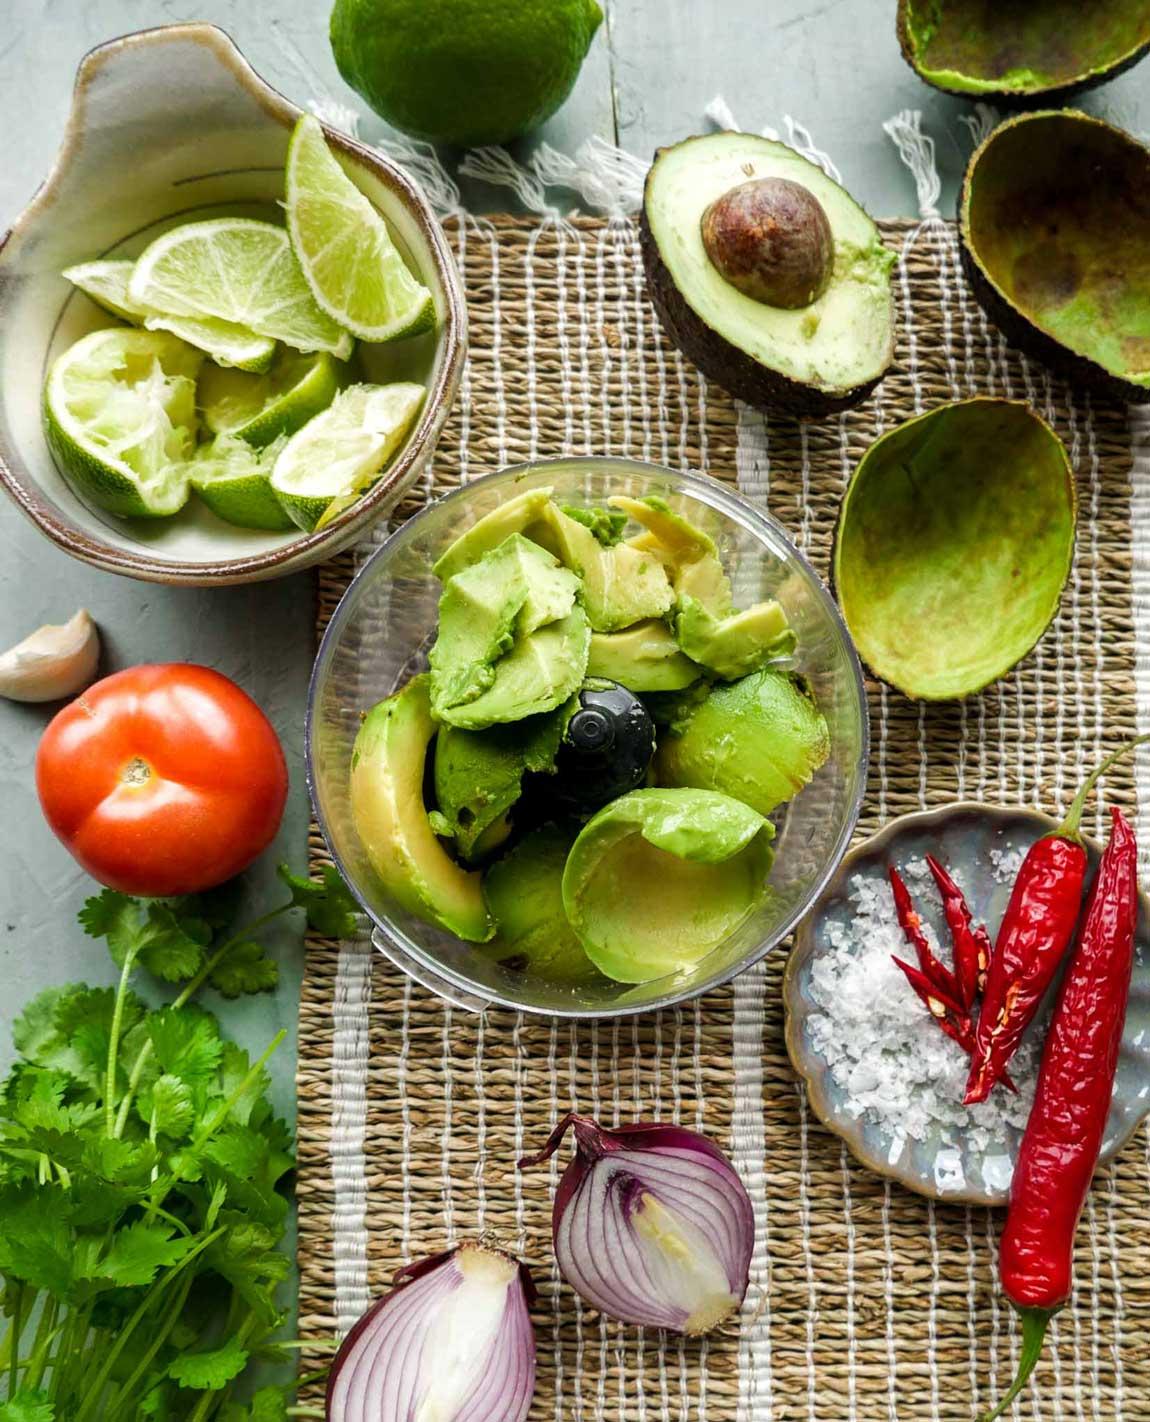 hvordan laver man guacamole